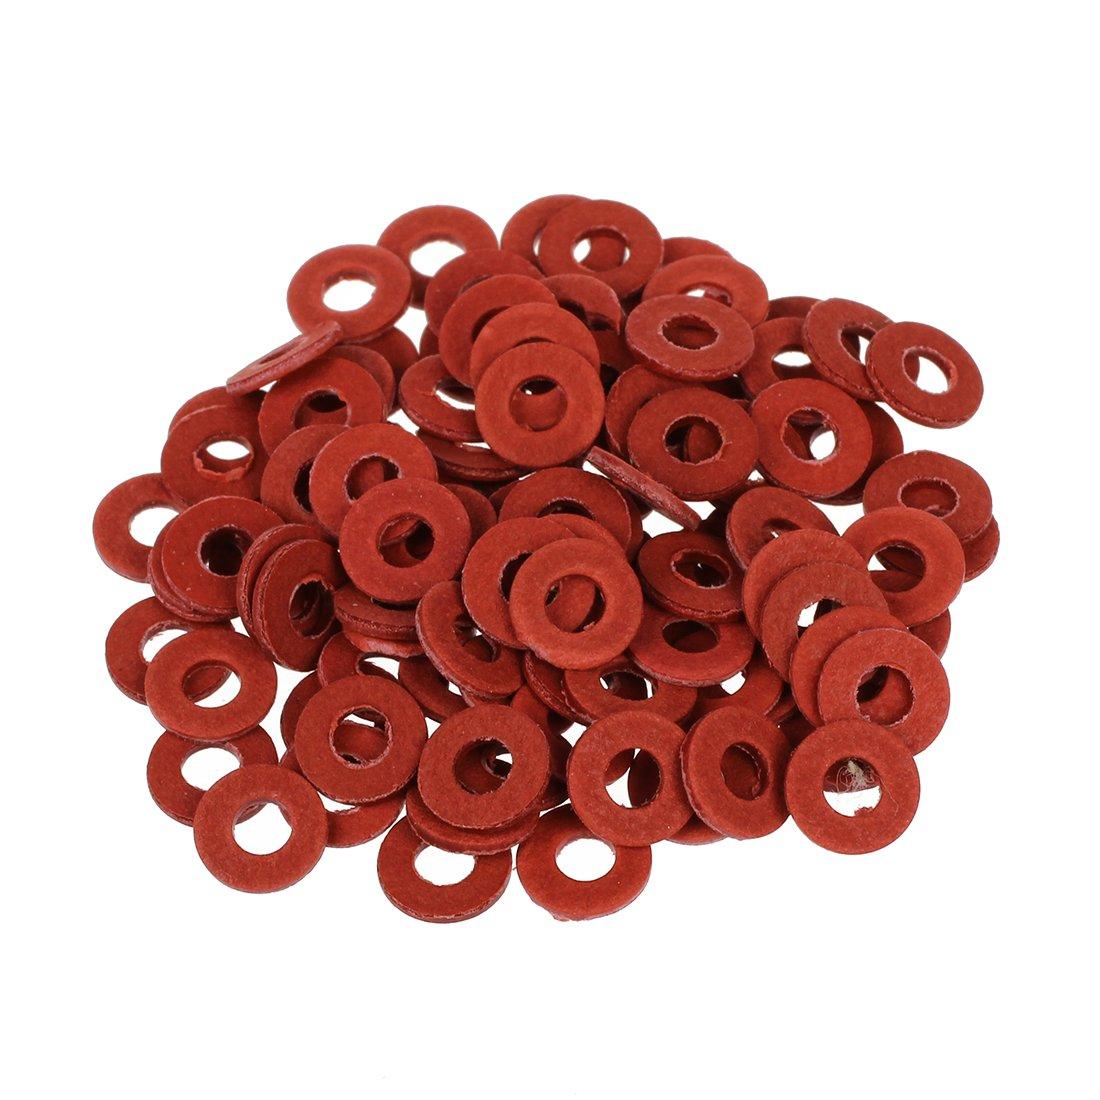 Semoic 100 x Arandela de Fibra Tornillo Aislante para Placa Base Rojo